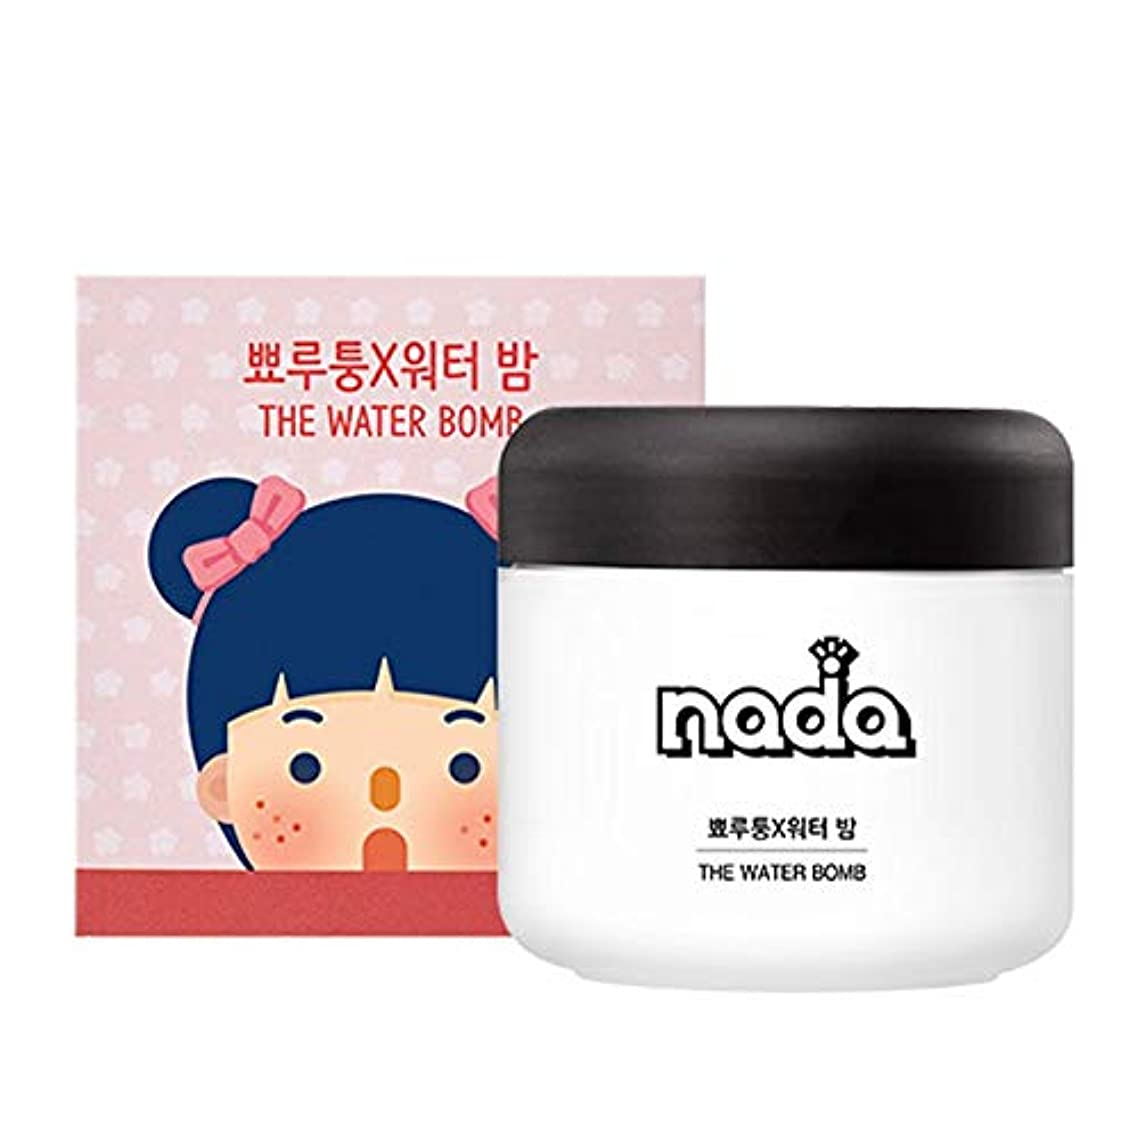 BEST韓国水爆弾50グラムモイスチャライジングフェイスクリームケア寧アンチリンクル化粧品NADA